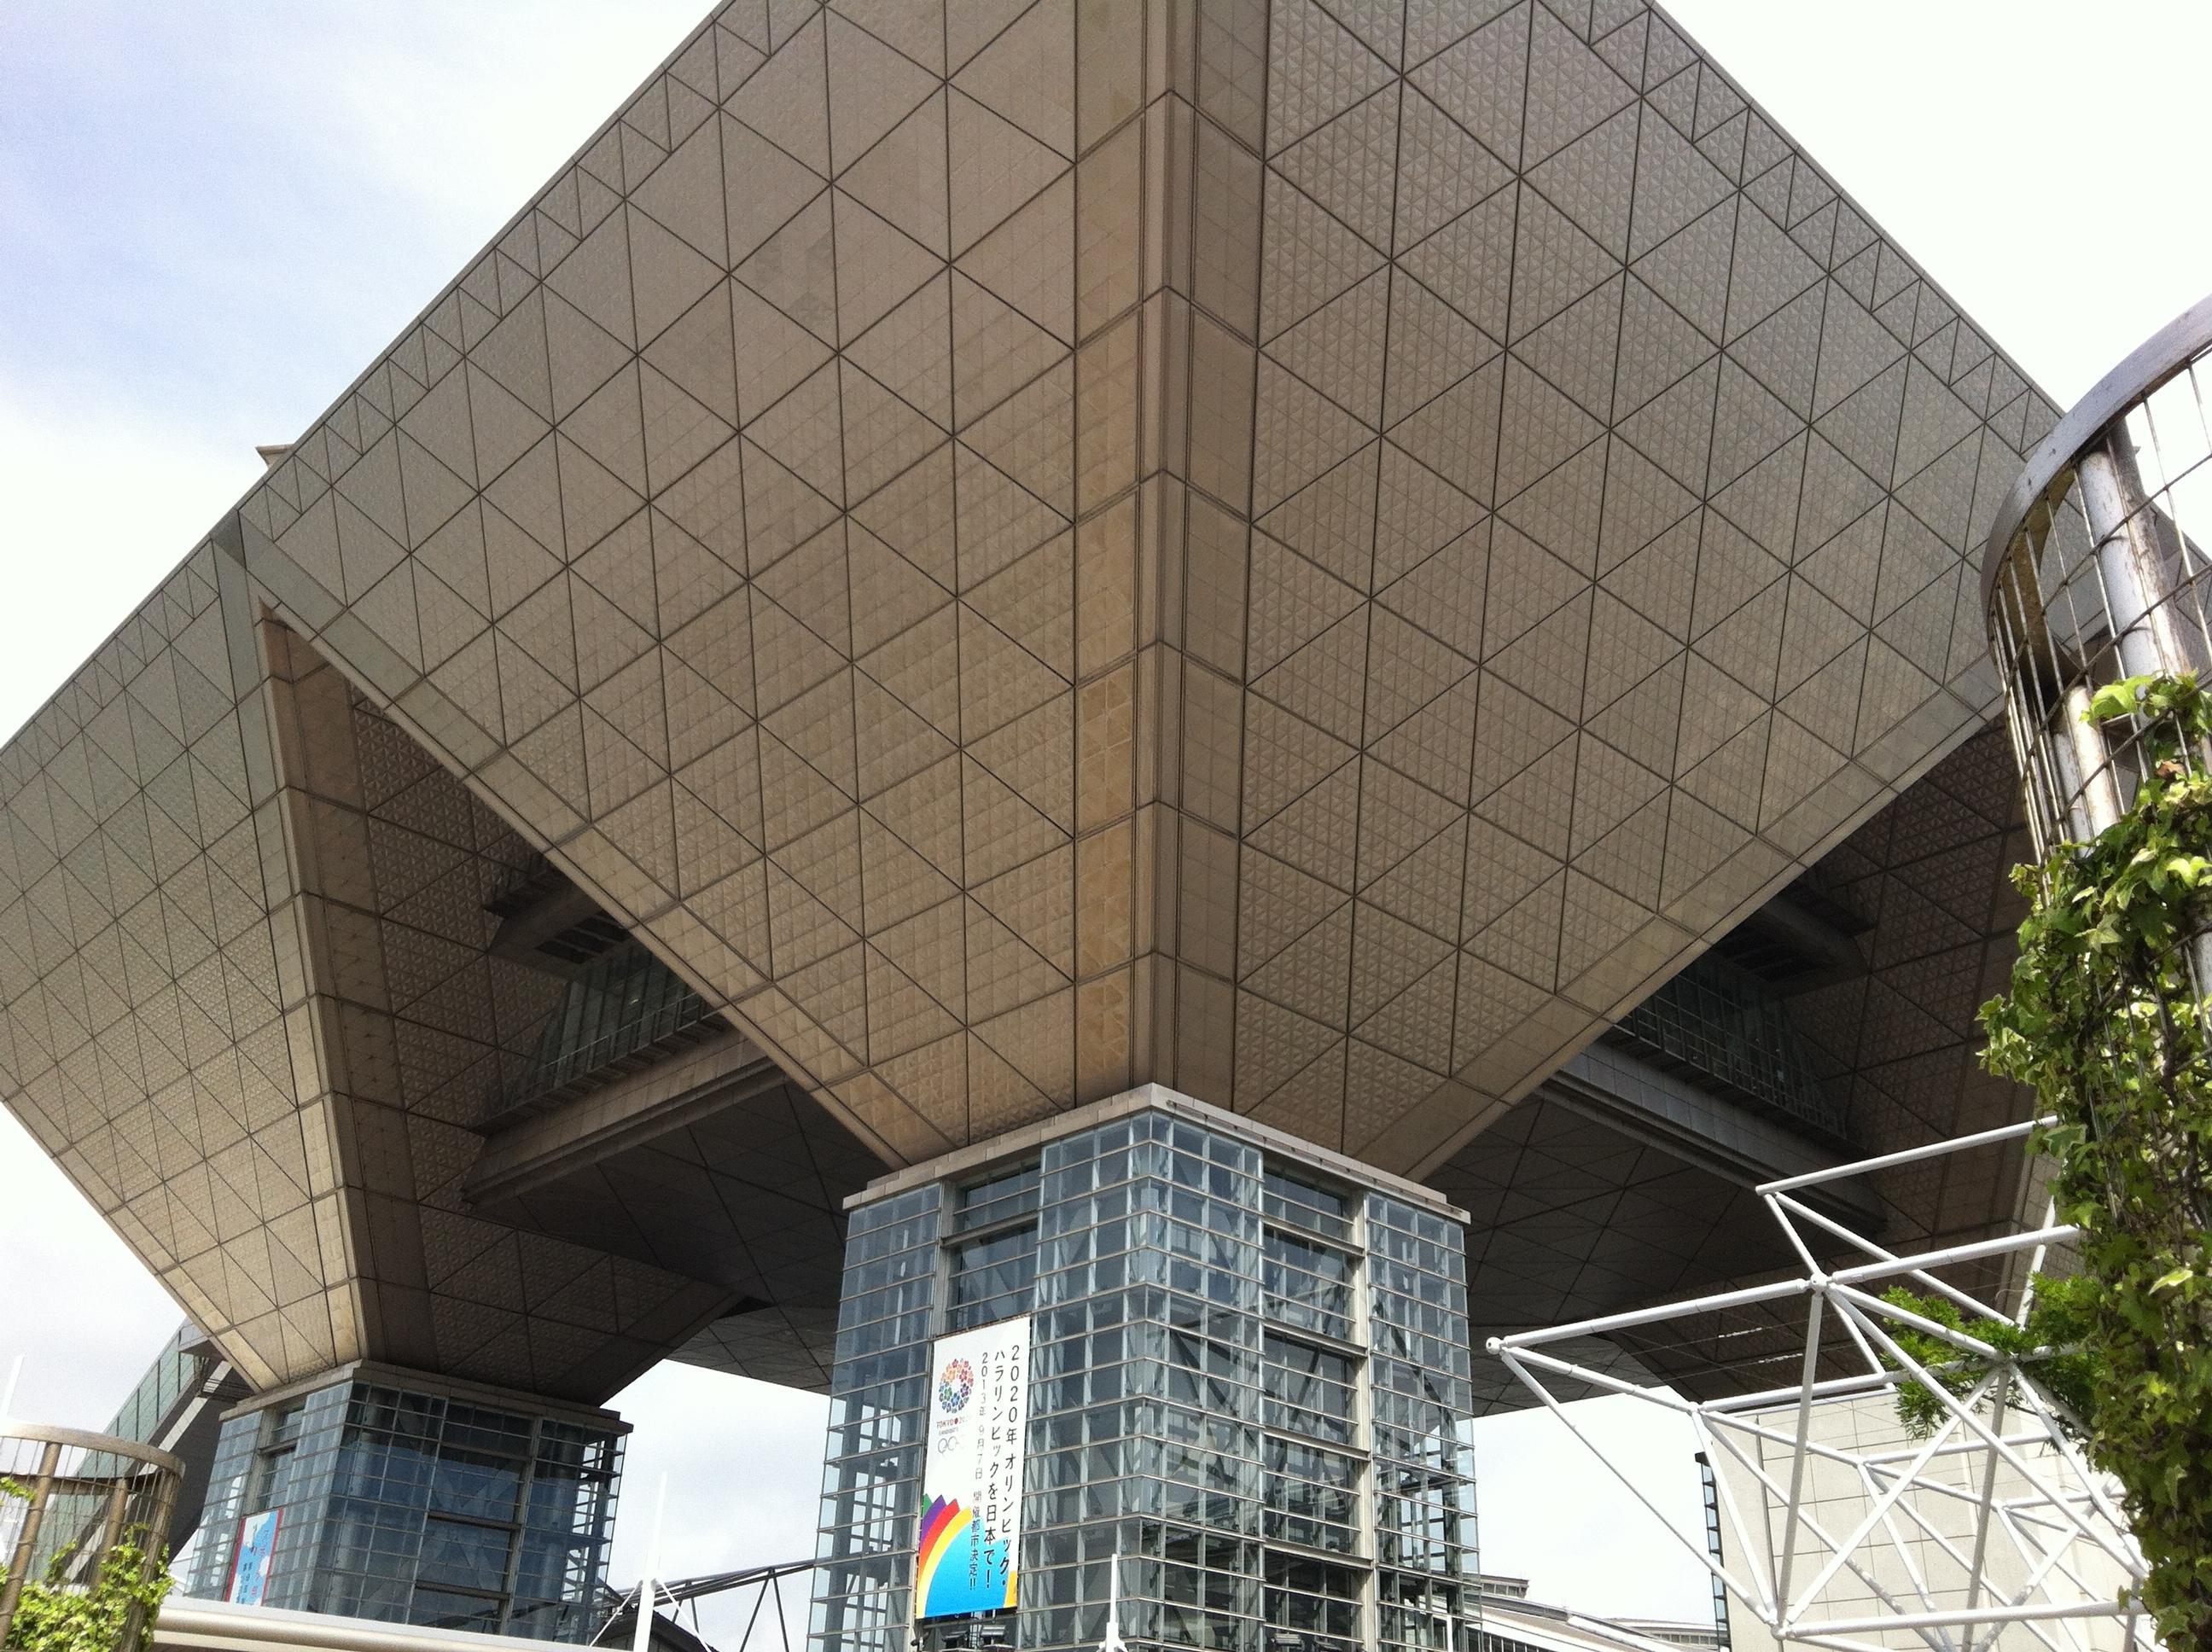 Tokyo Big Sight (Tokyo International Exhibition Center) image7